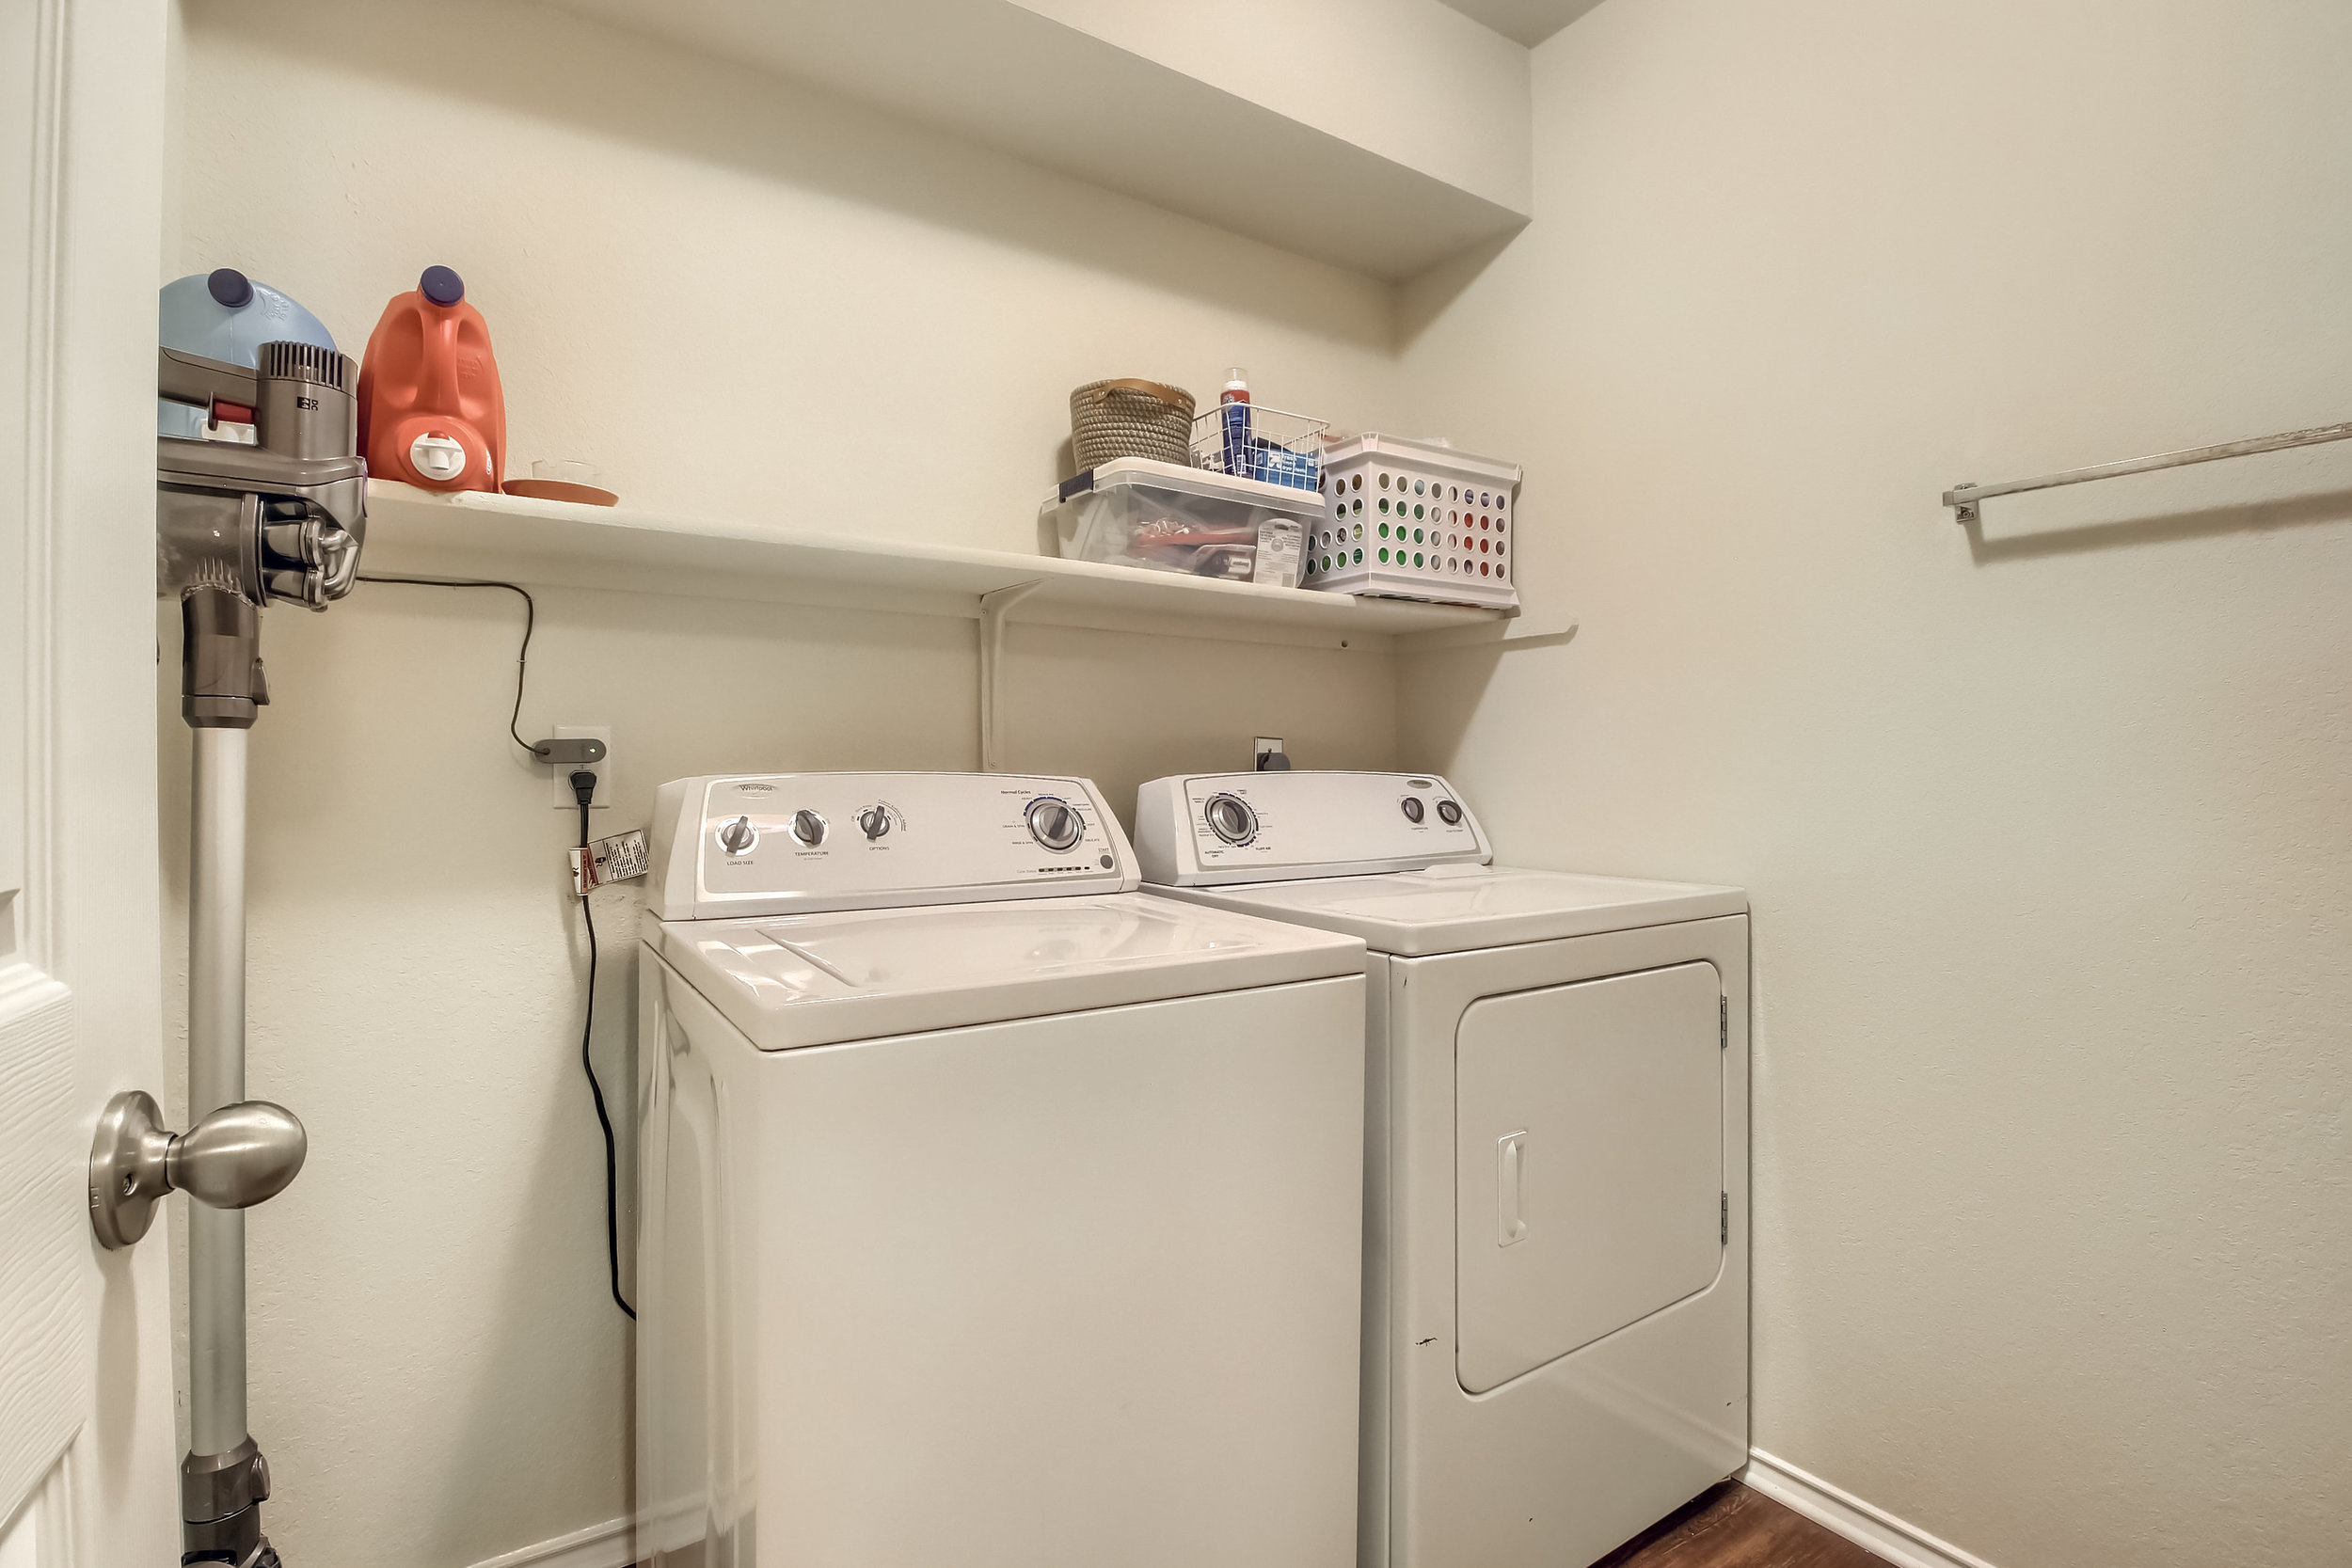 13_Laundry_Room_IMG_2062.JPG